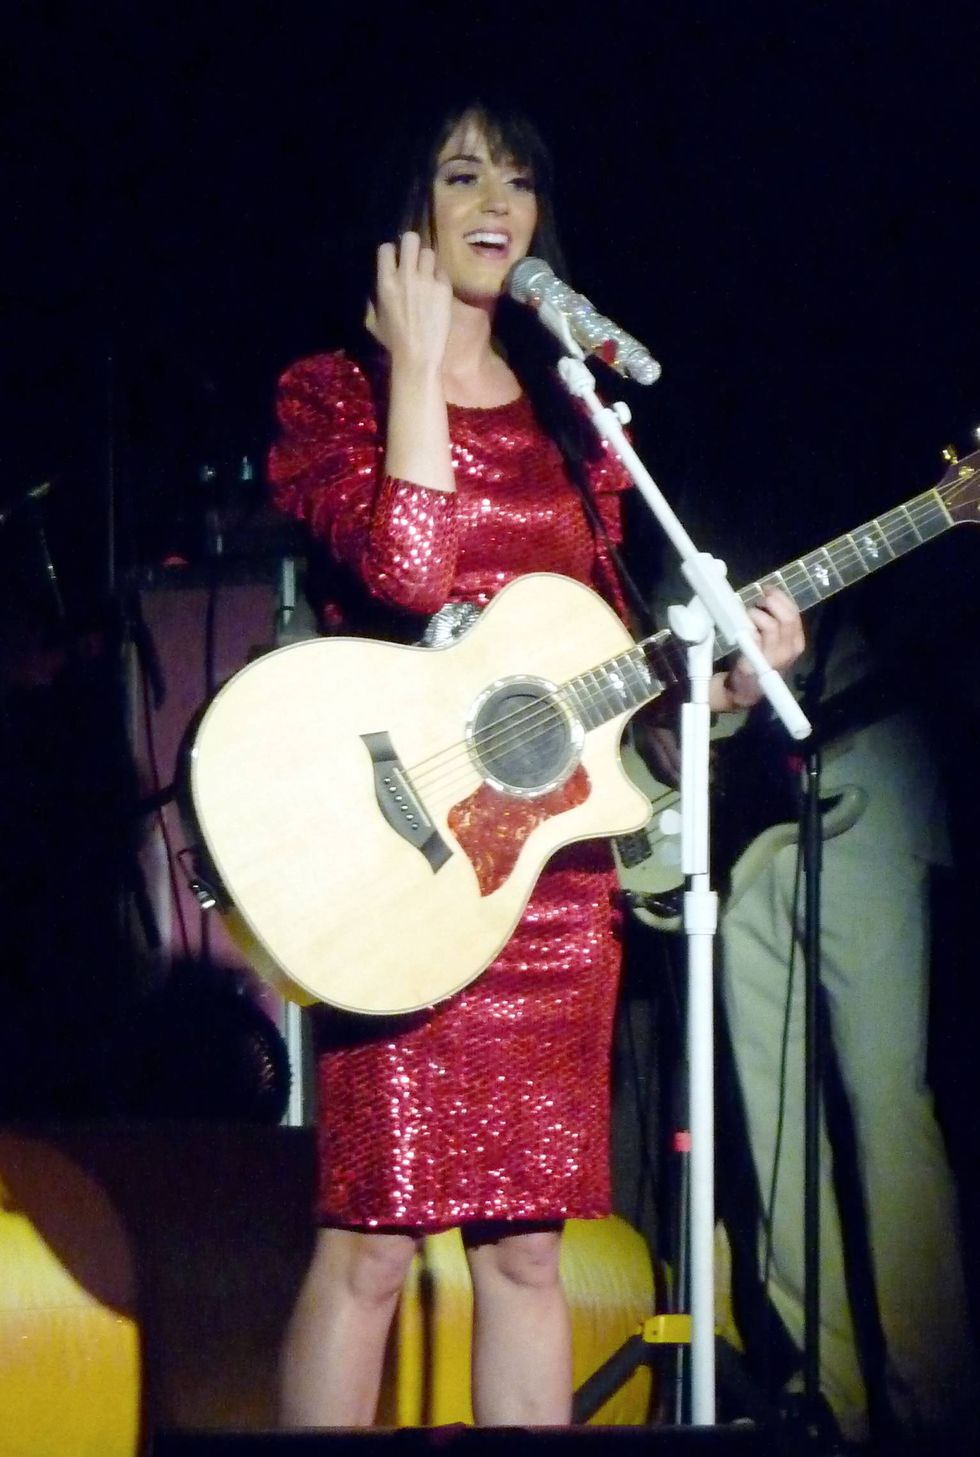 katy-perry-performing-in-fort-lauderdale-01